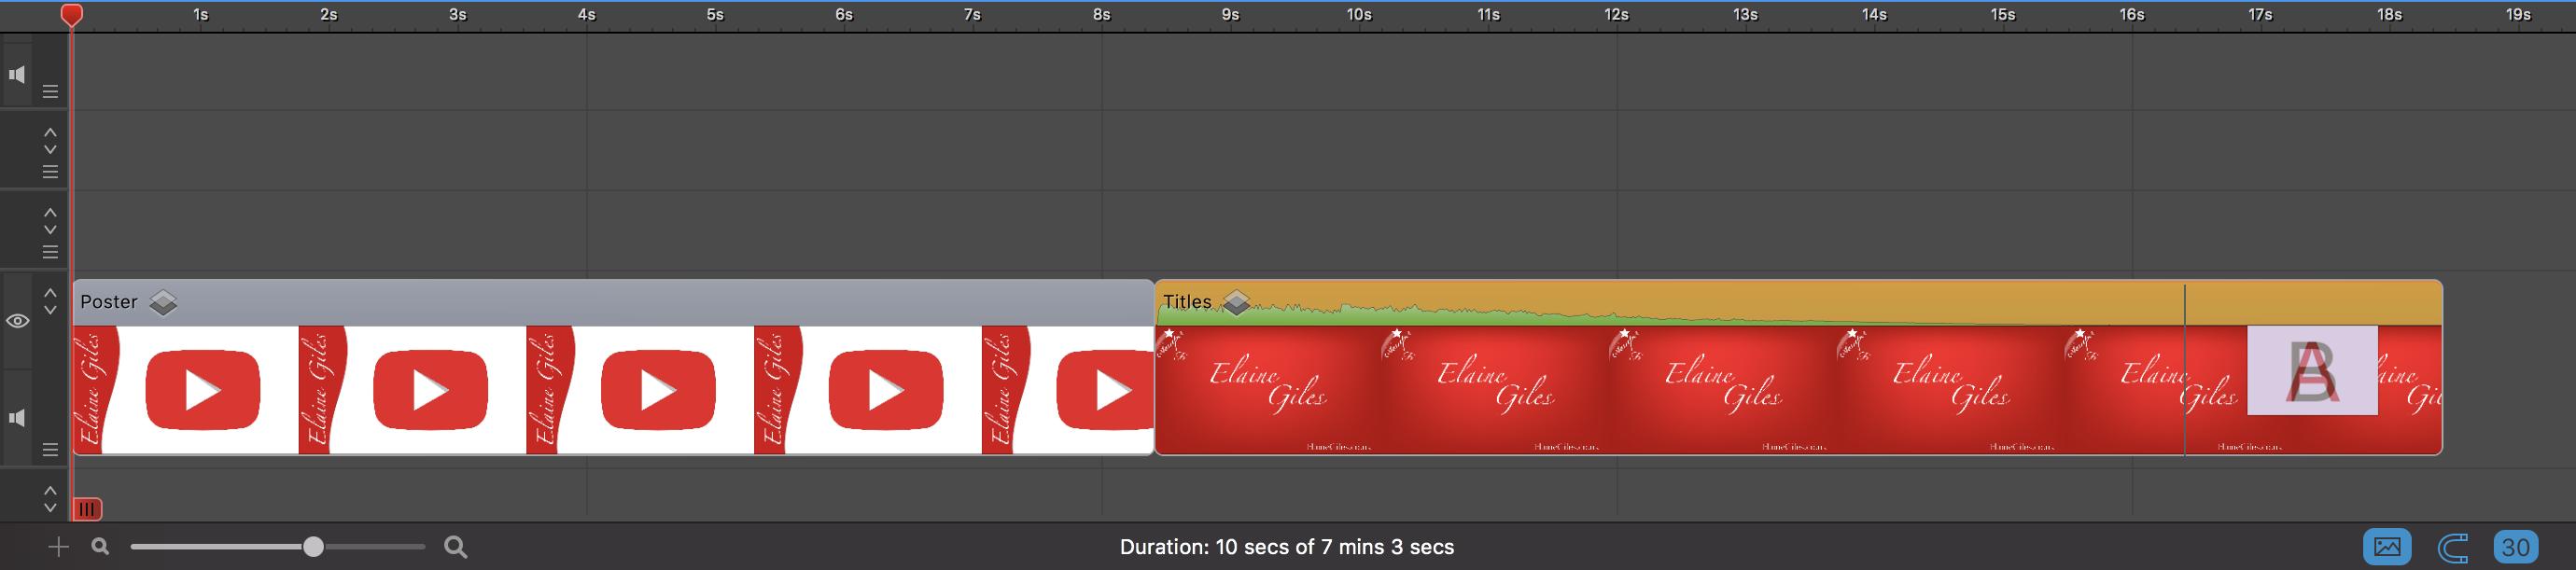 ScreenFlow 8 Timeline Thumbnails